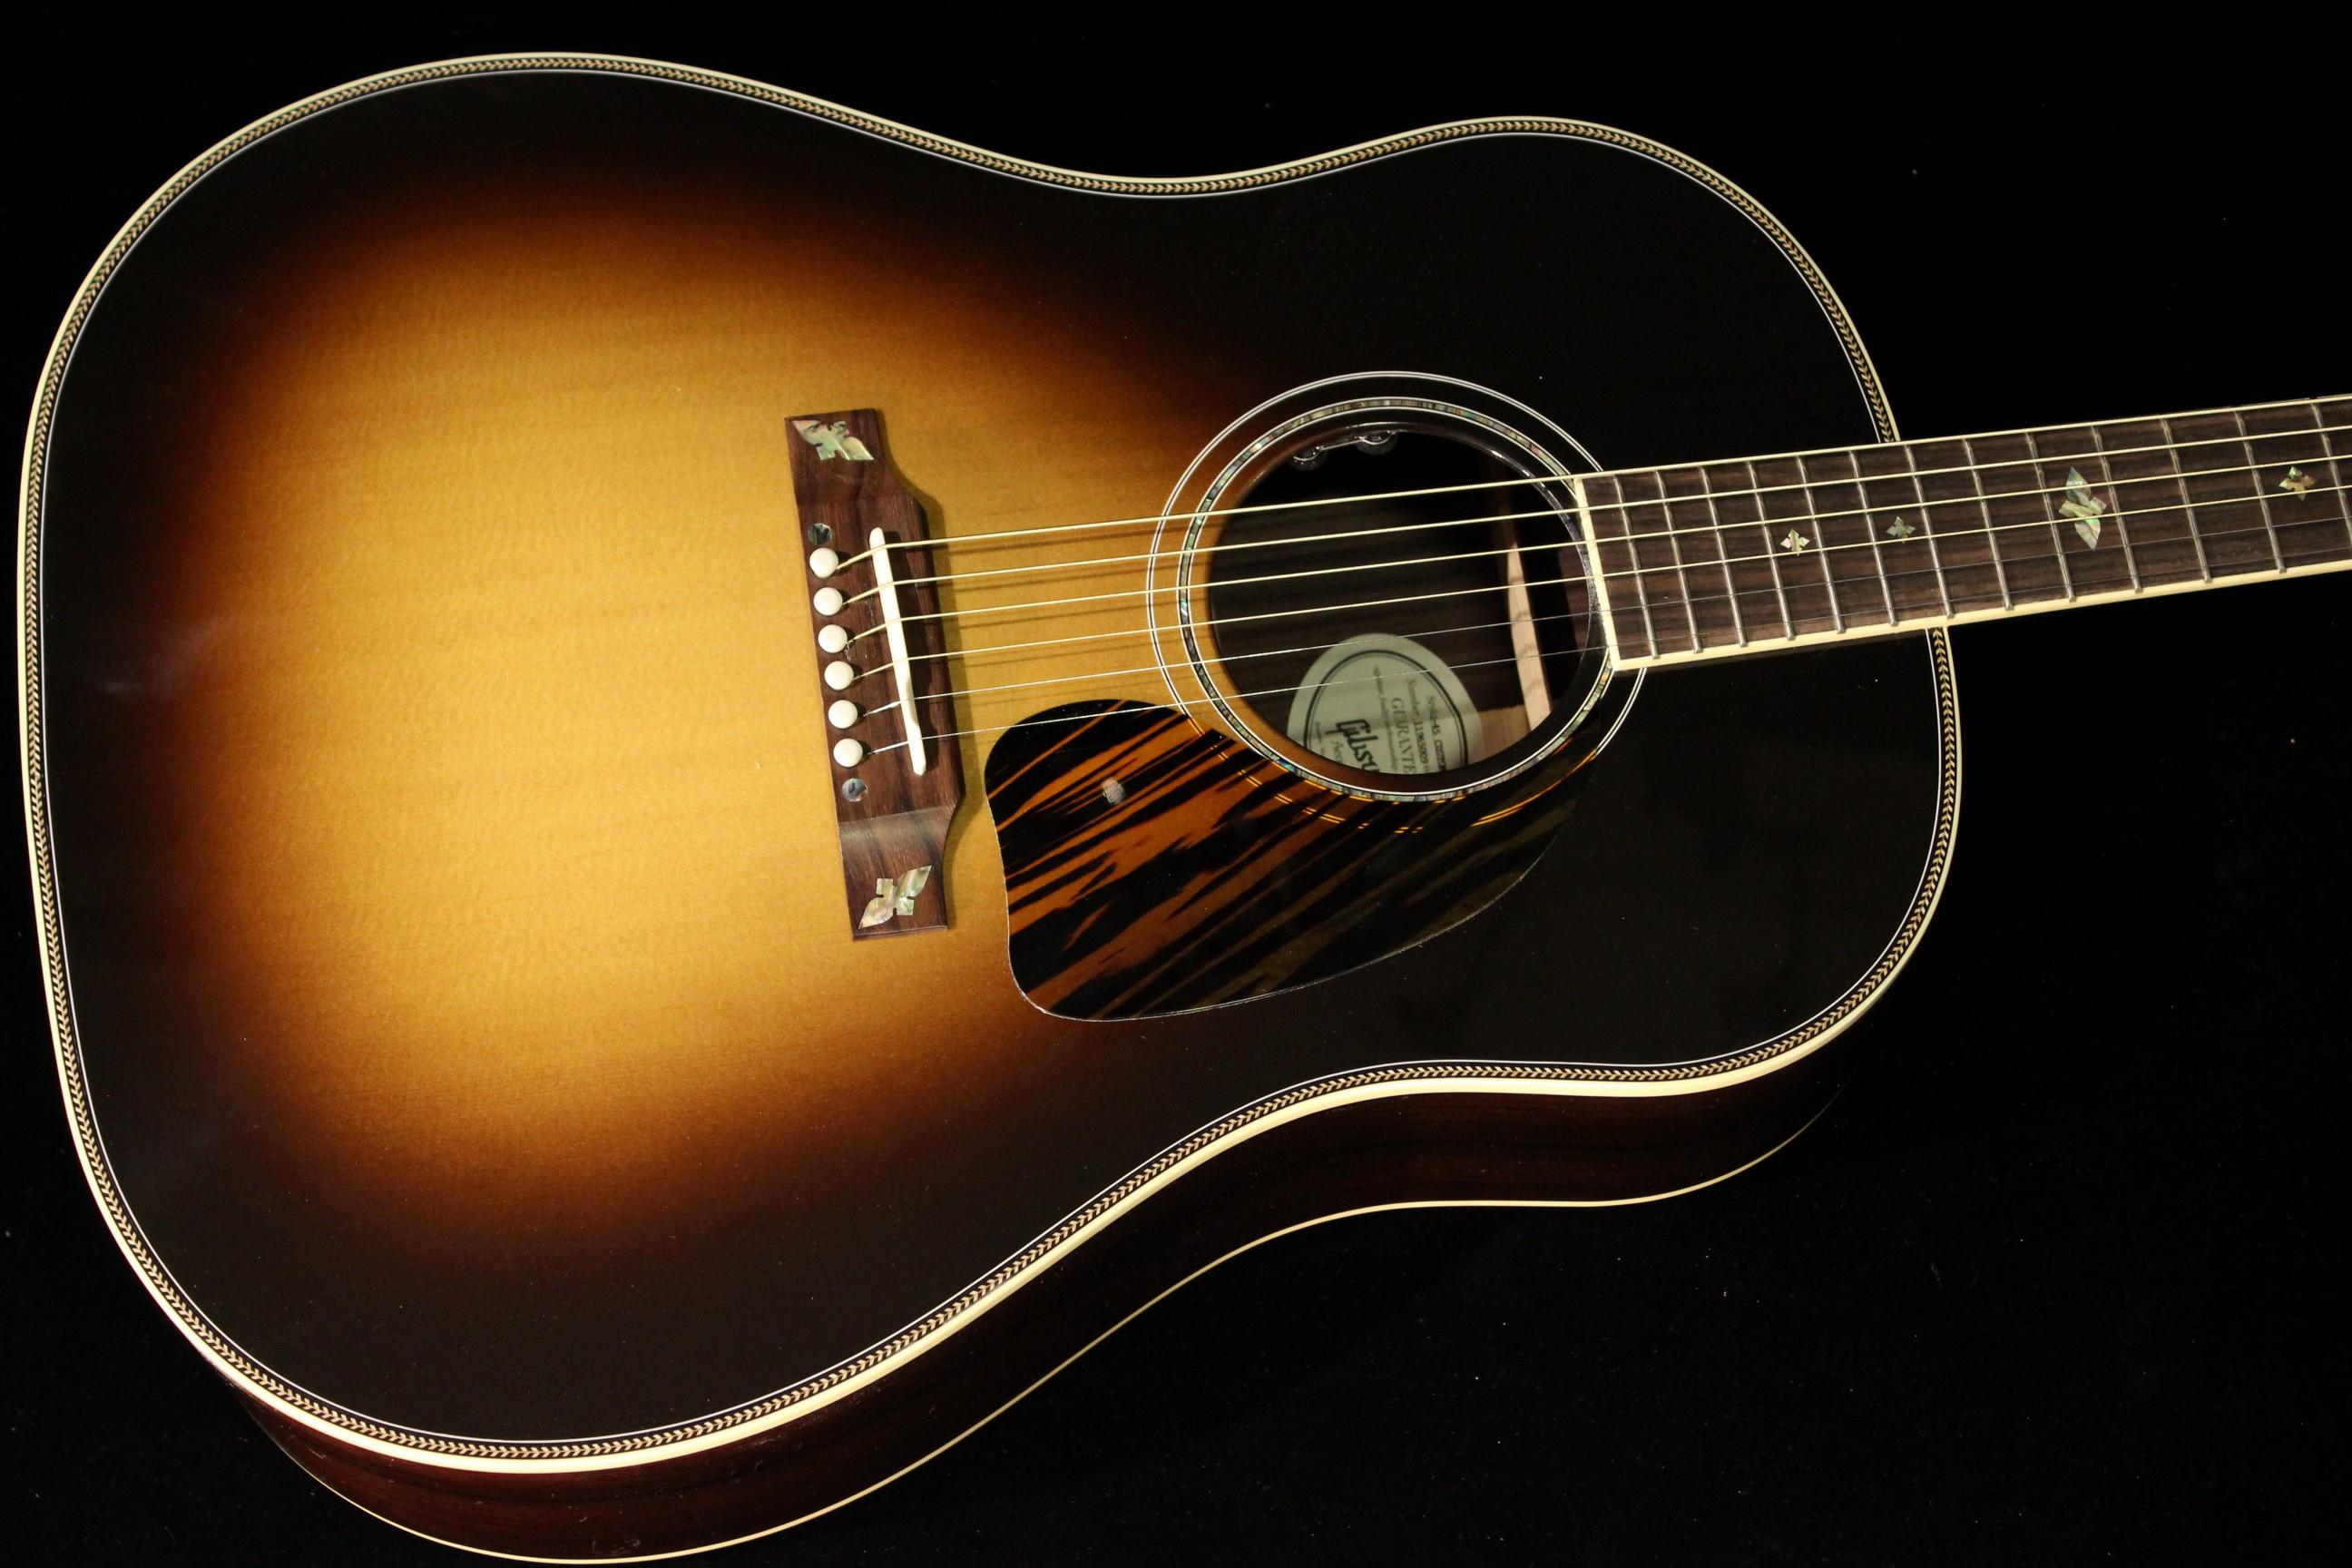 gibson j 45 custom 2016 vintage sunburst sn 11965009 gino guitars. Black Bedroom Furniture Sets. Home Design Ideas